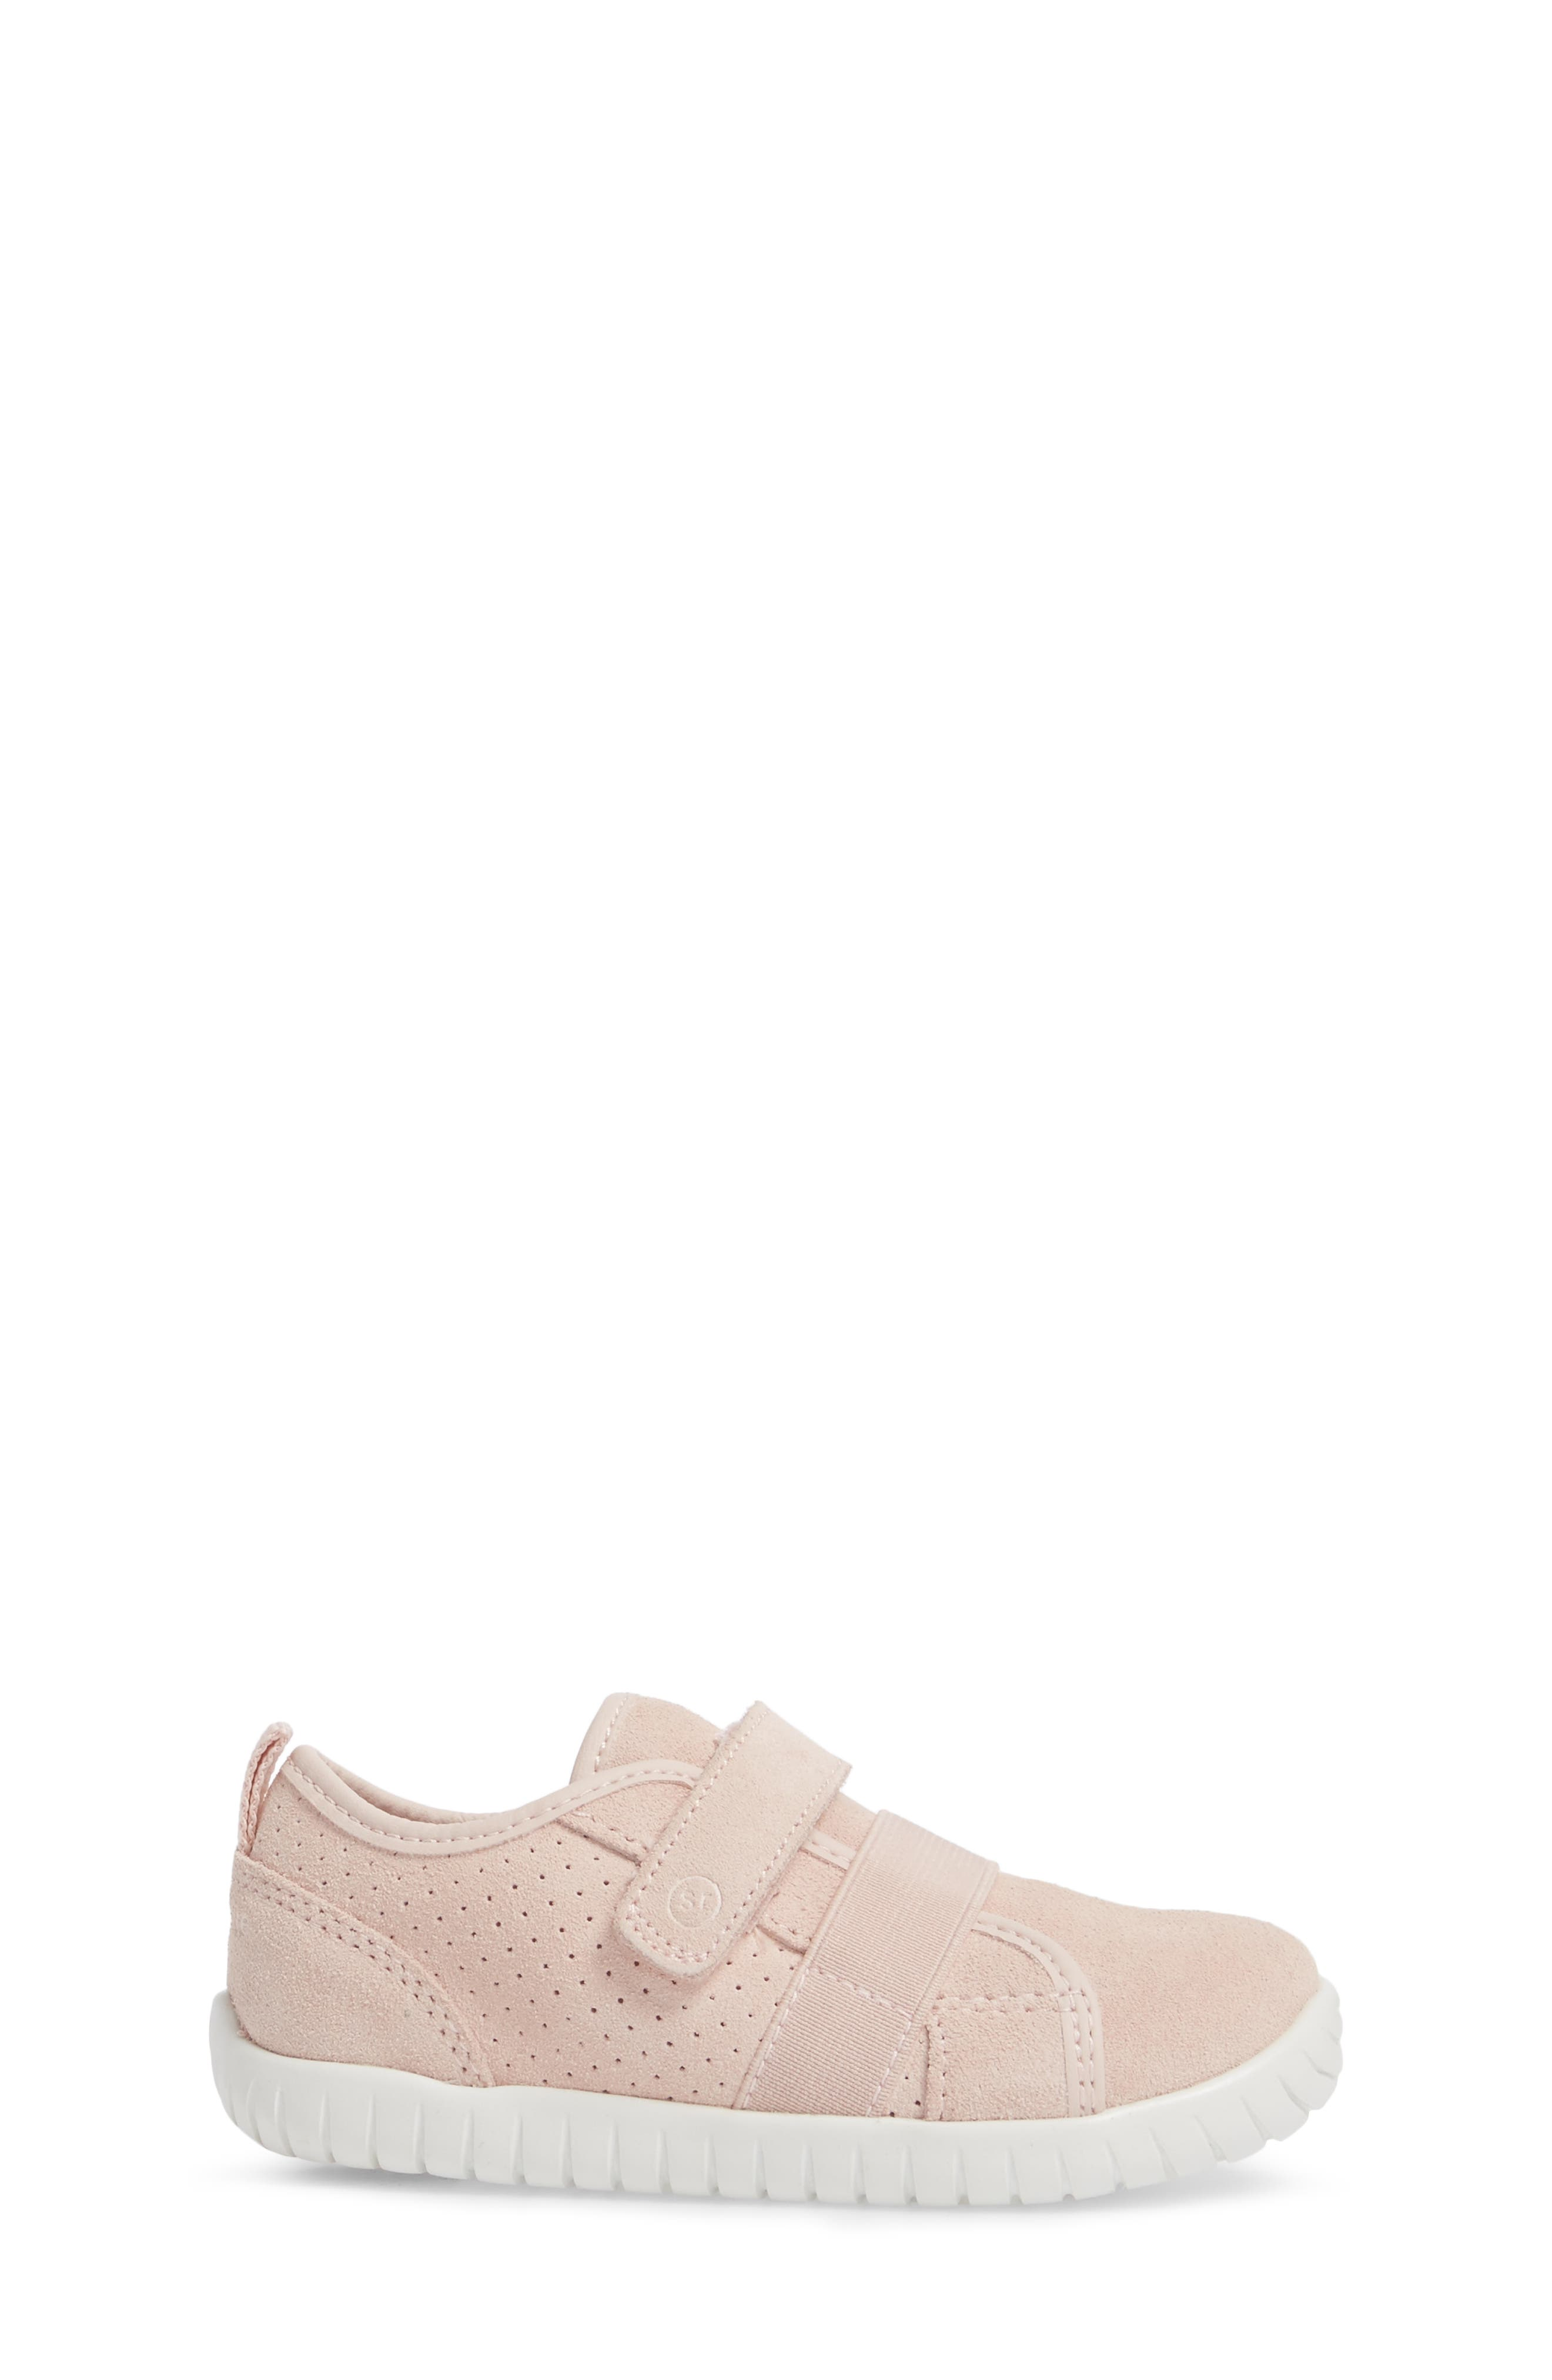 SRtech<sup>™</sup> Riley Sneaker,                             Alternate thumbnail 3, color,                             Blush Leather